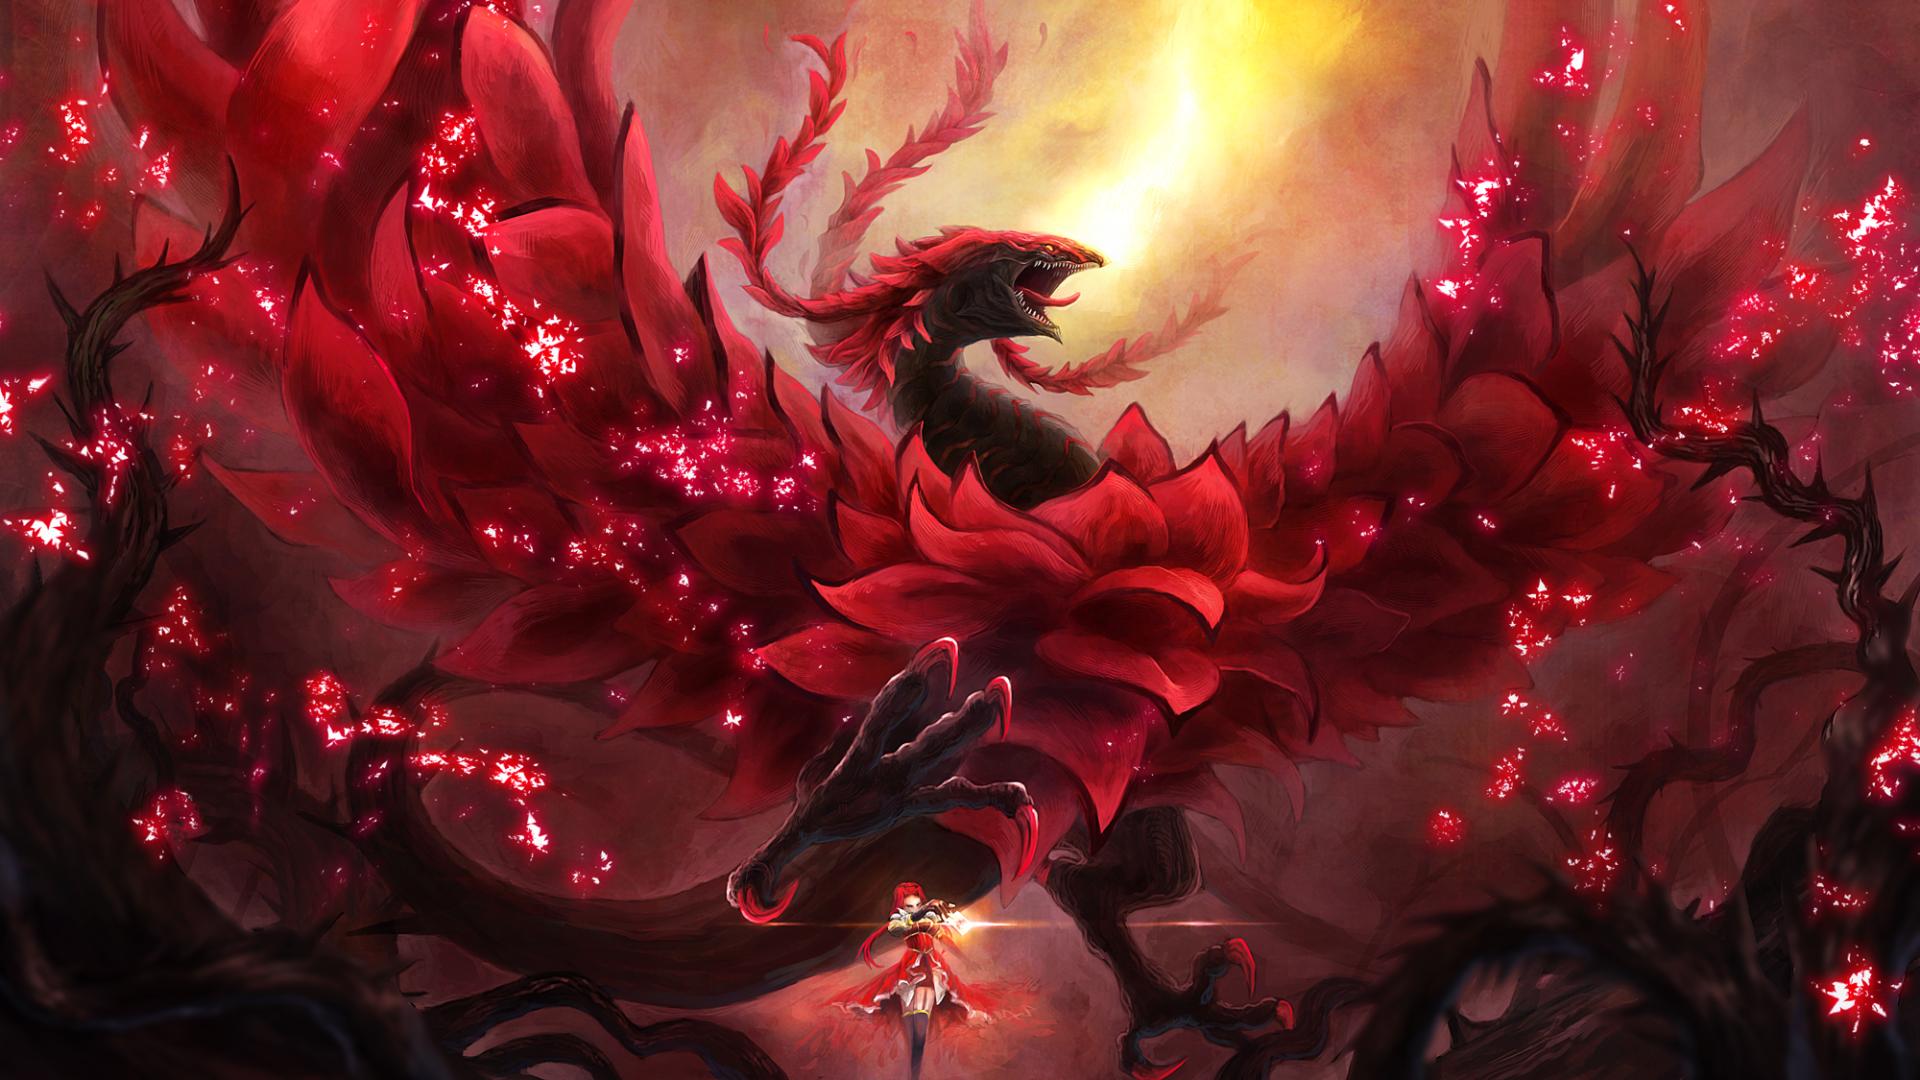 Pin By Iridi On Legend Black Rose Dragon Yugioh Black Rose